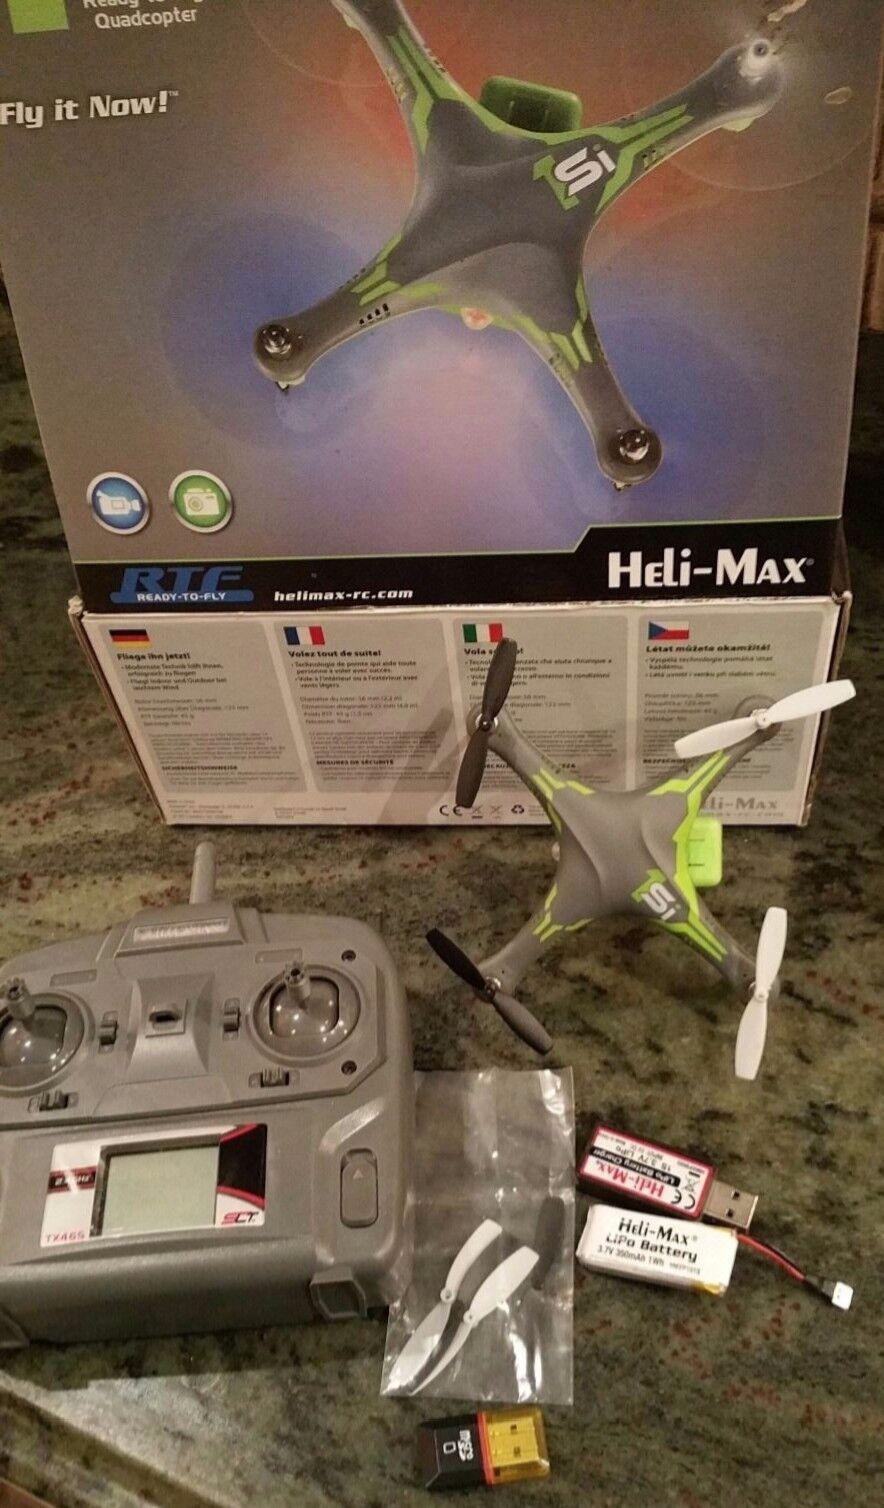 Heli-Max 1Si ReadyToFly Quadcopter, Drone, Video Camera + Auto Return HMXE0832